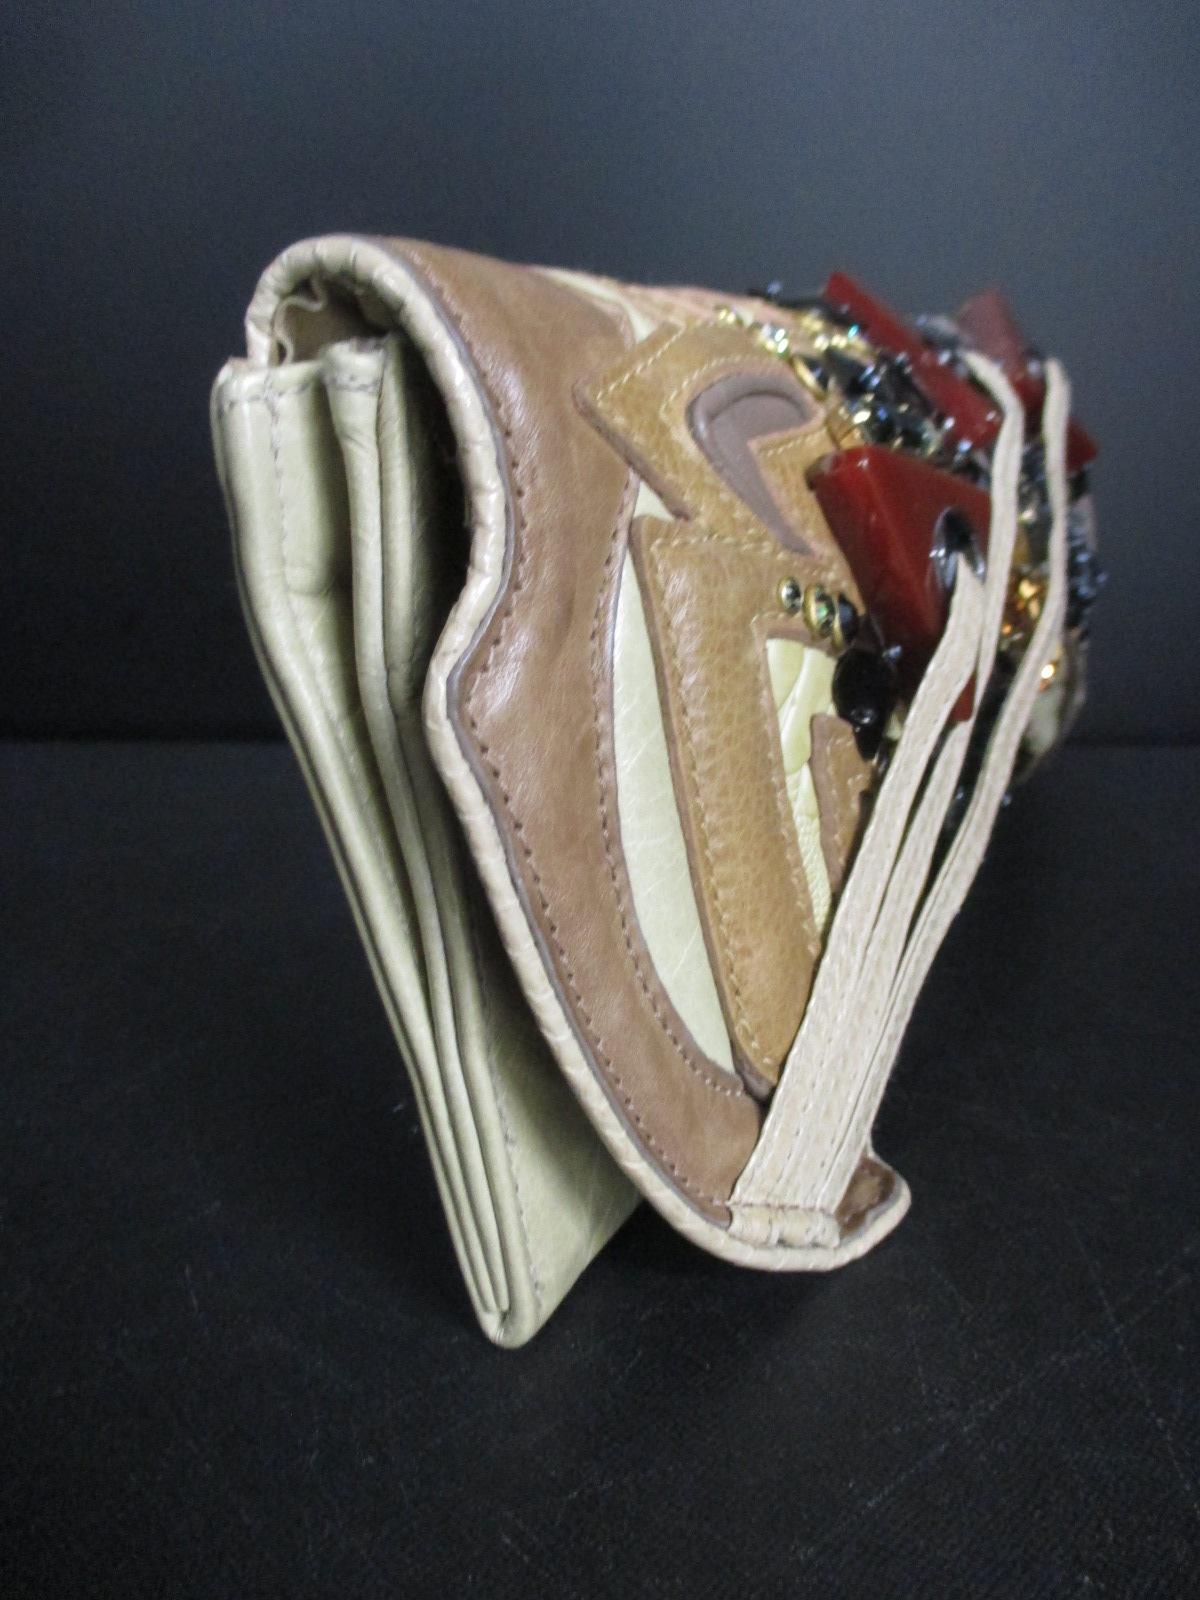 BRACHER EMDEN(ブレイシャー・エムデン)のクラッチバッグ